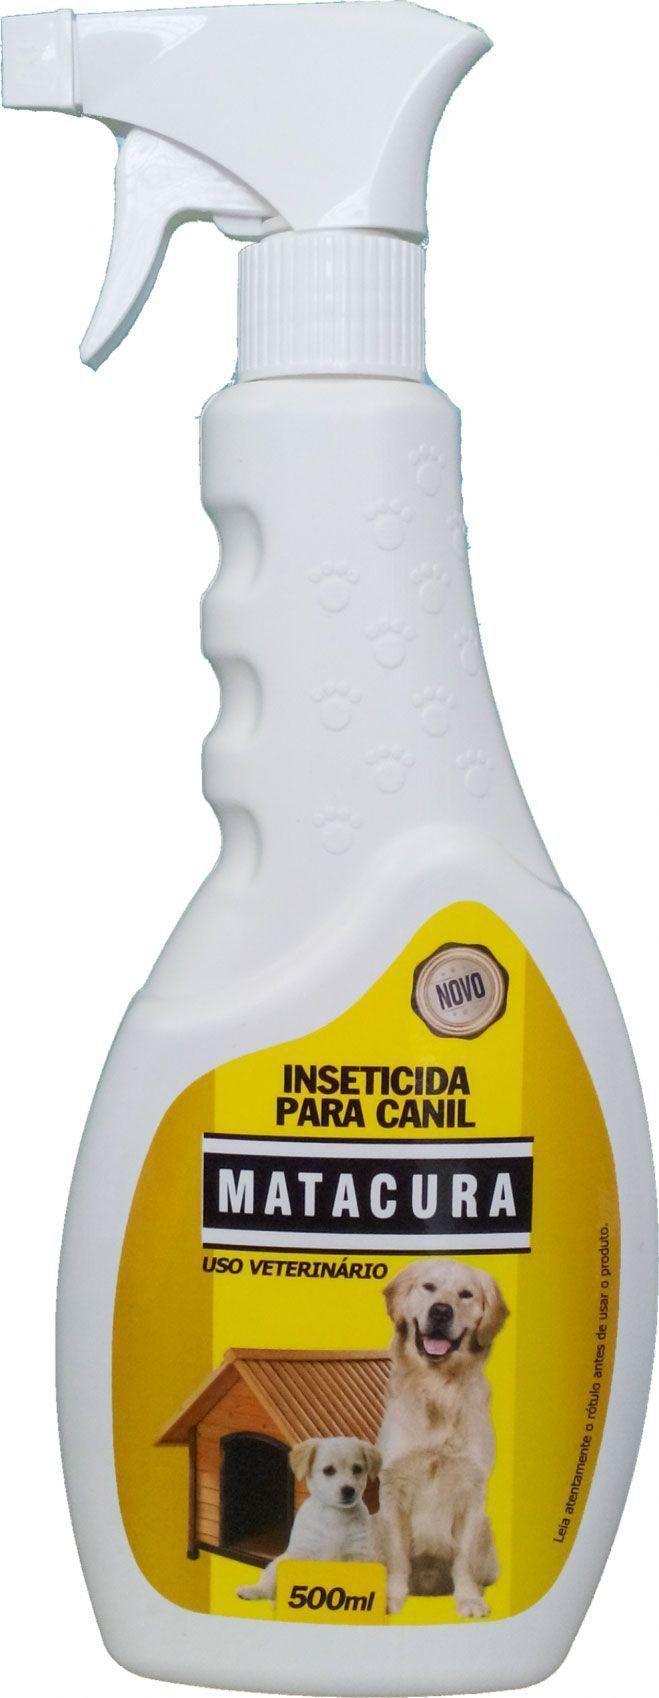 Inseticida Matacura em Spray para Canil - 500 mL